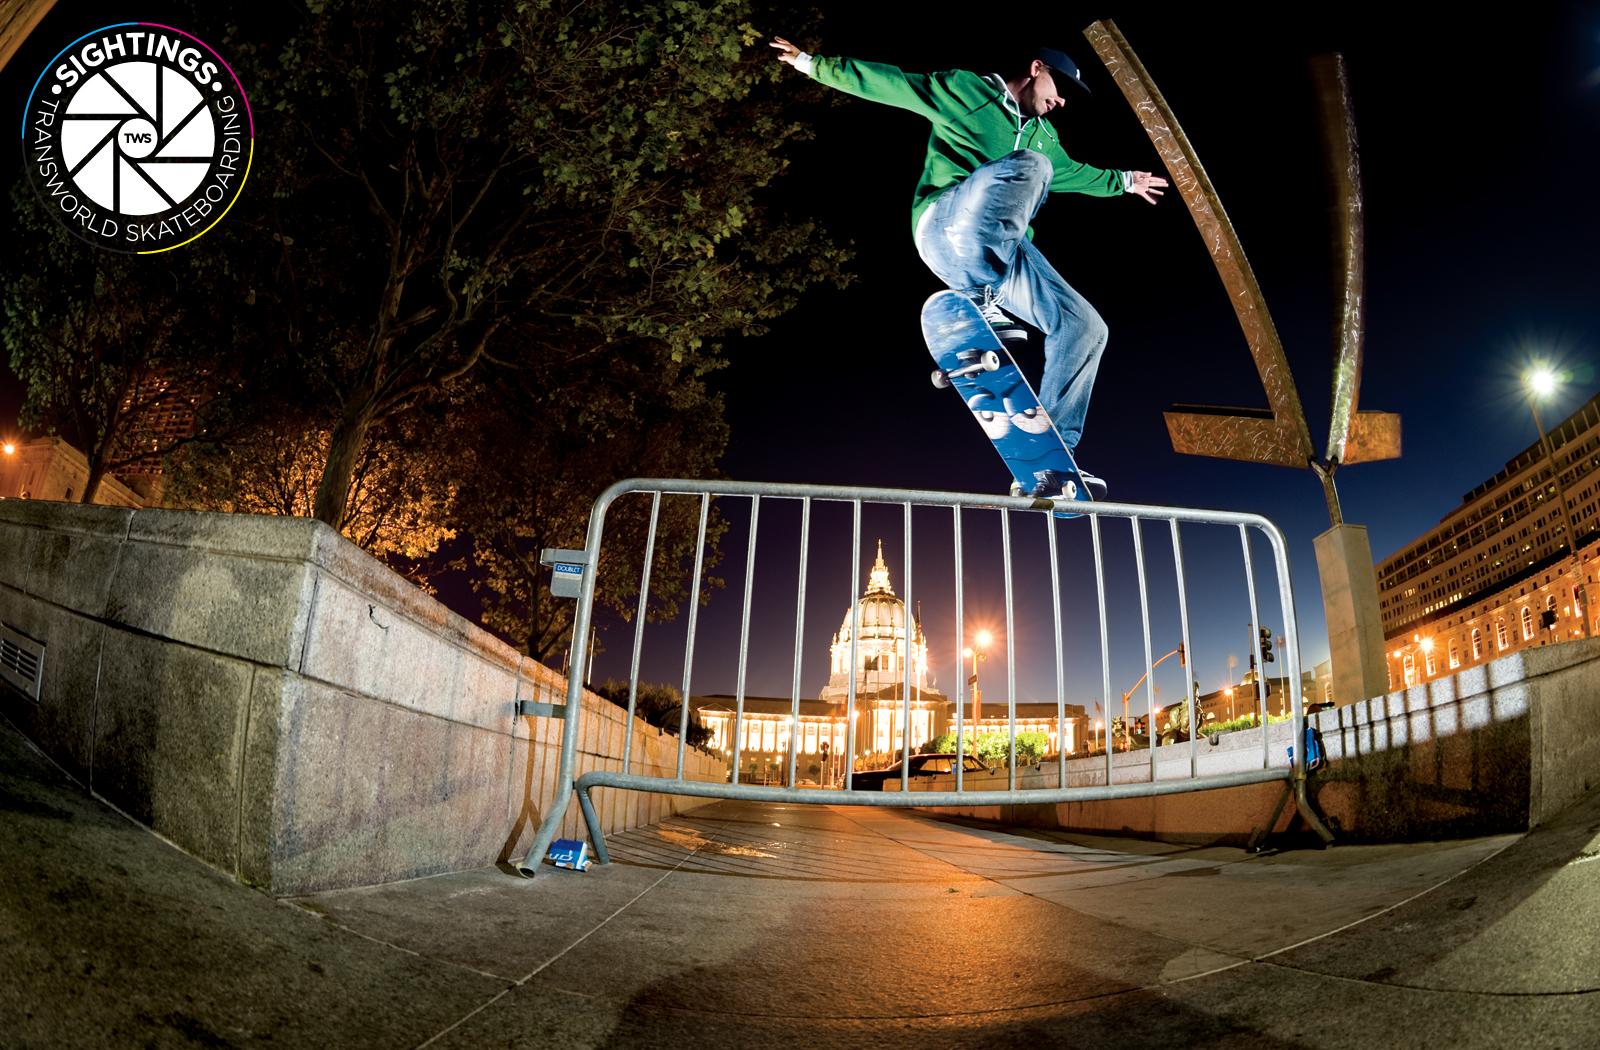 Imgenes Hilandy Fondo de Pantalla Transworld Skateboarding 1600x1050